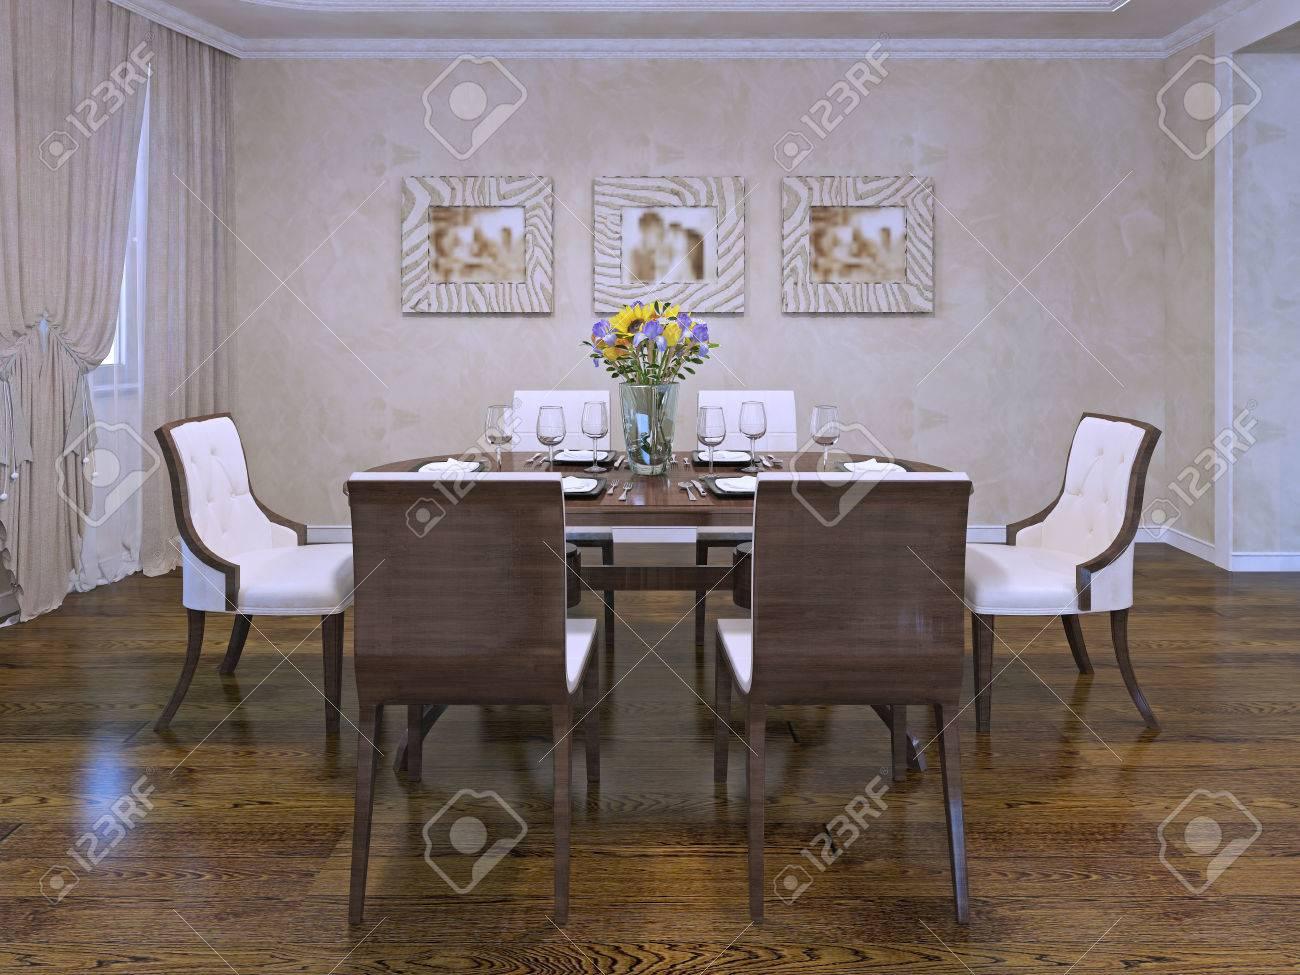 Ontwerp van eetkamer in privé huis mooie witte stoelen met